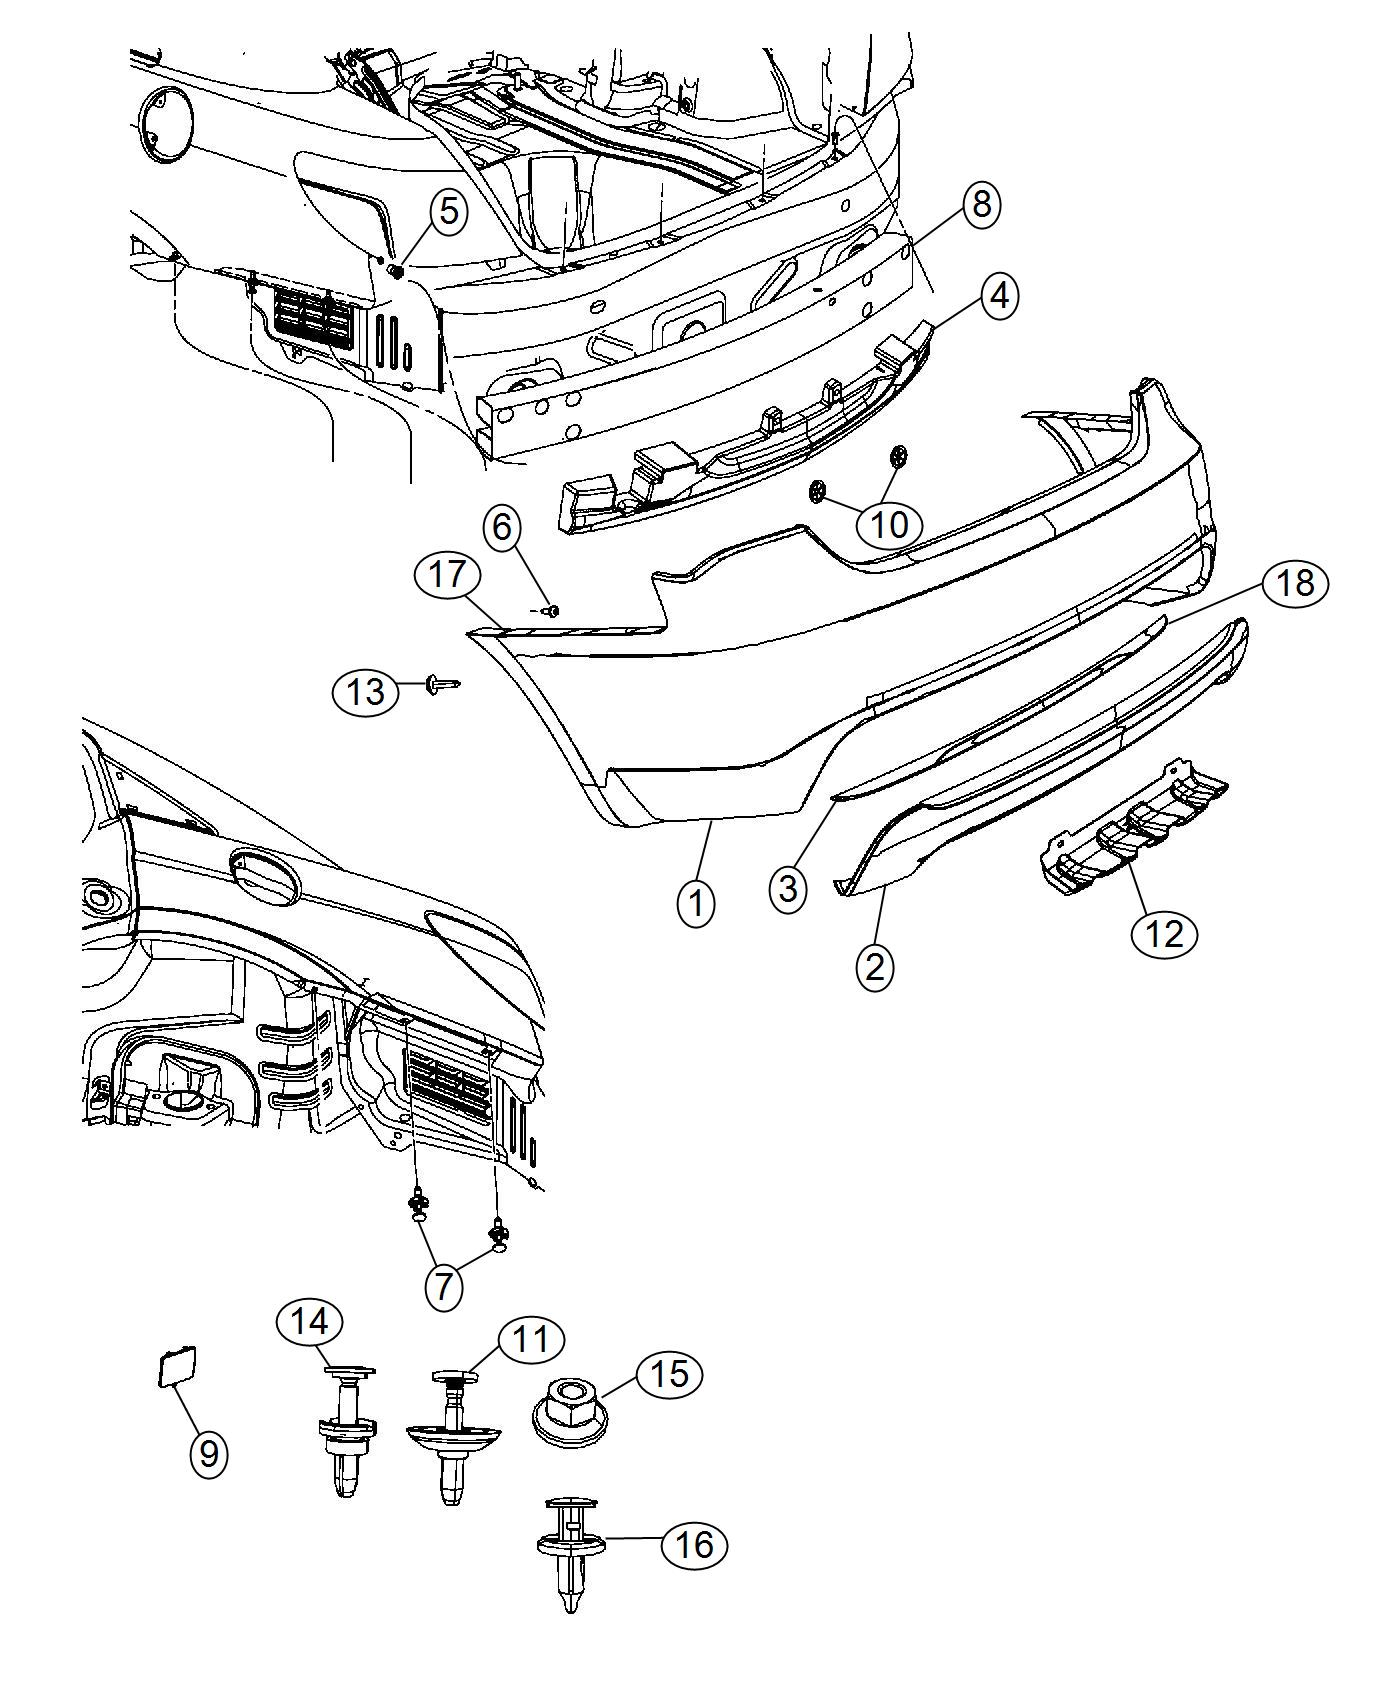 Chrysler 200 Fascia. Rear lower. [body color fascias